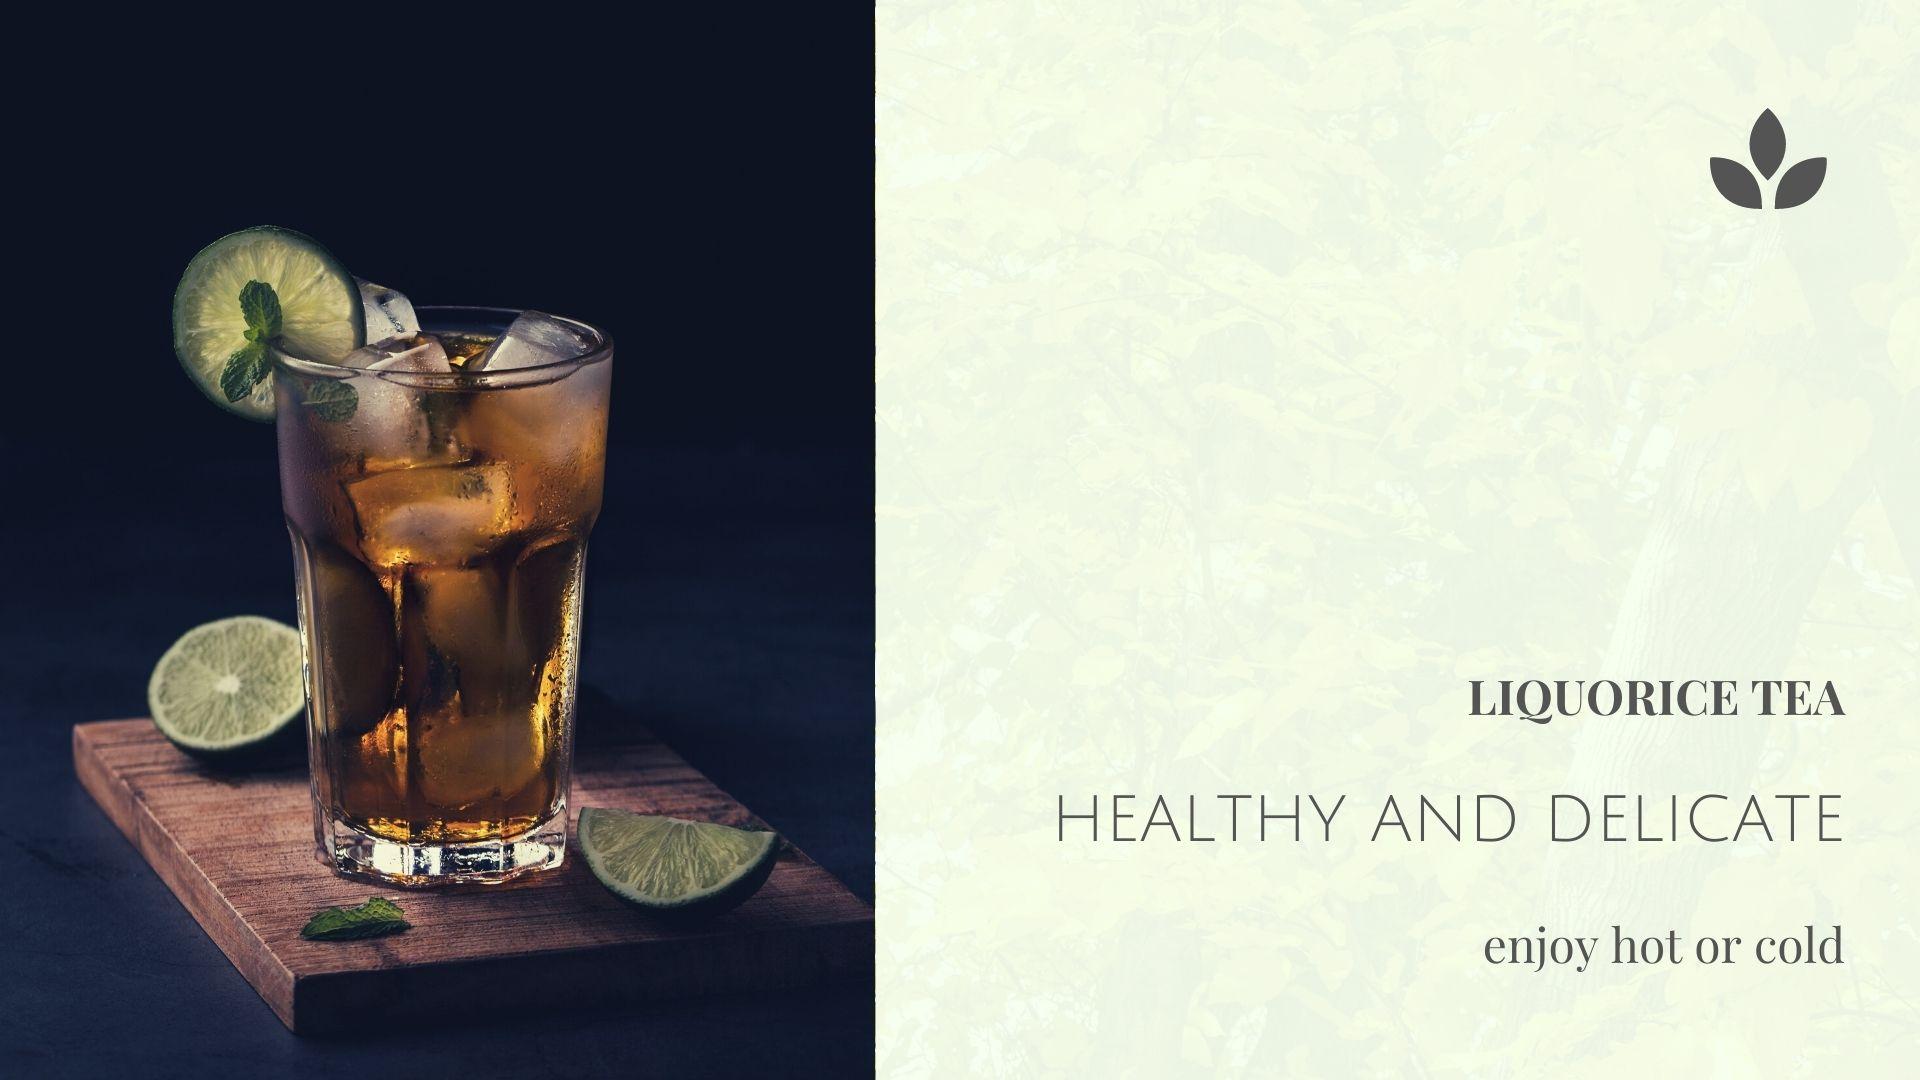 liquorice tea benefits and side effects semper tea